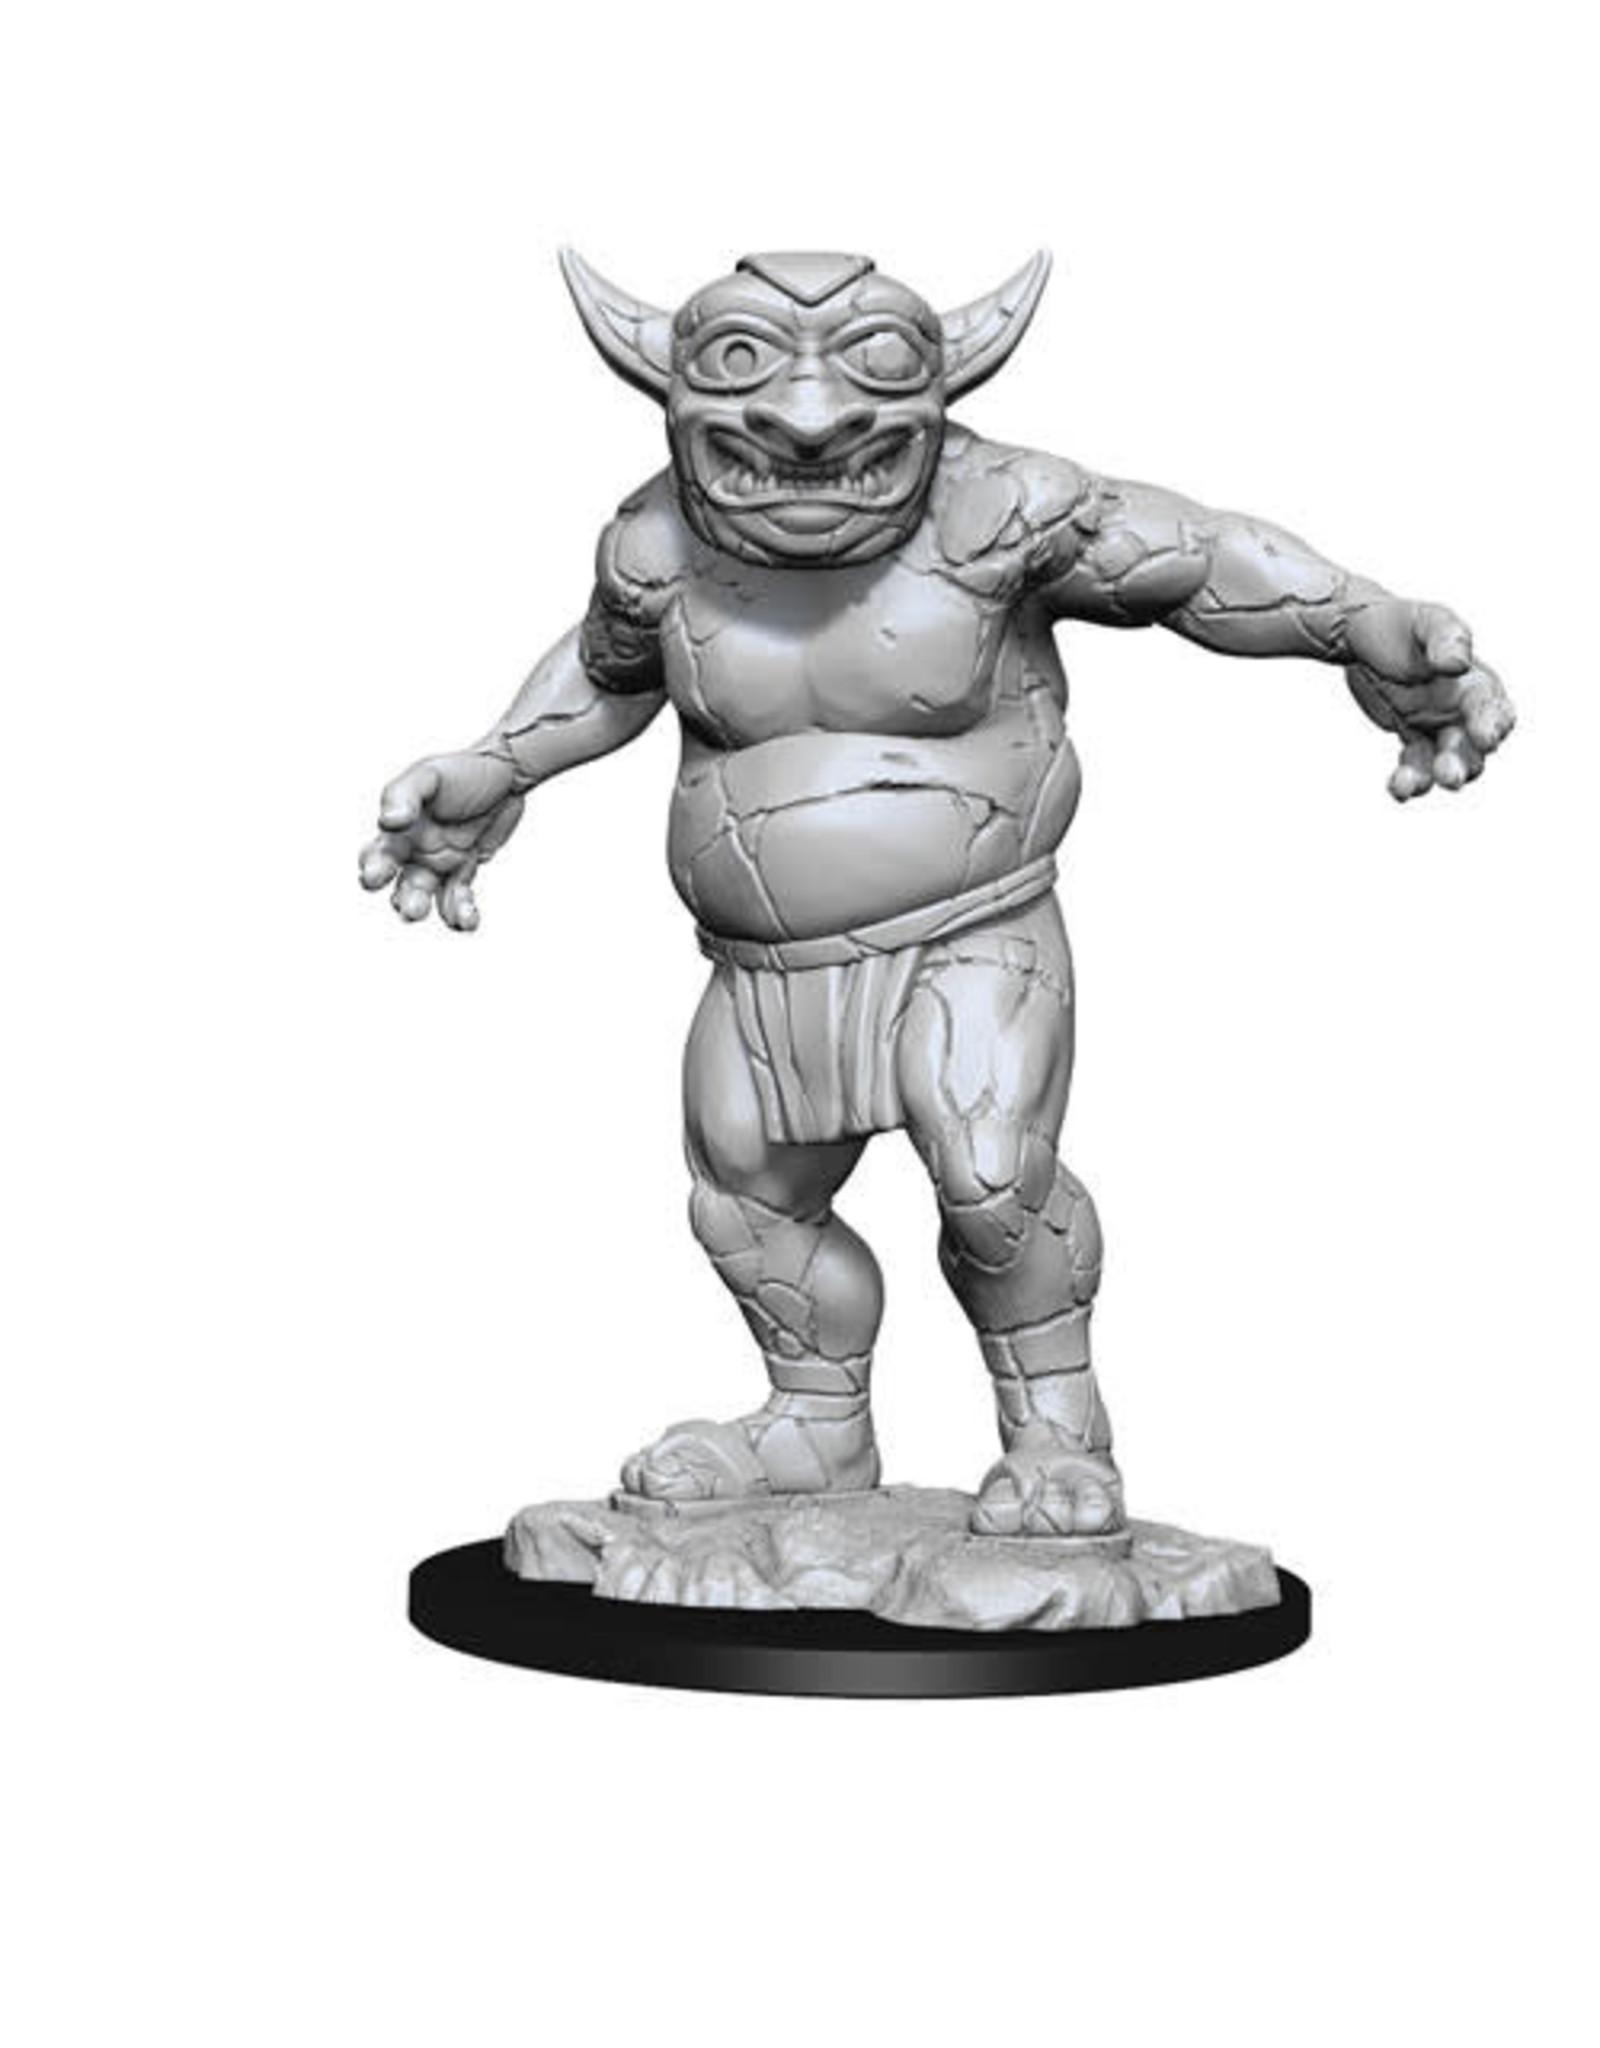 D&D Unpainted Minis: Eidolon Possessed Sacred Statue (Wave 13)